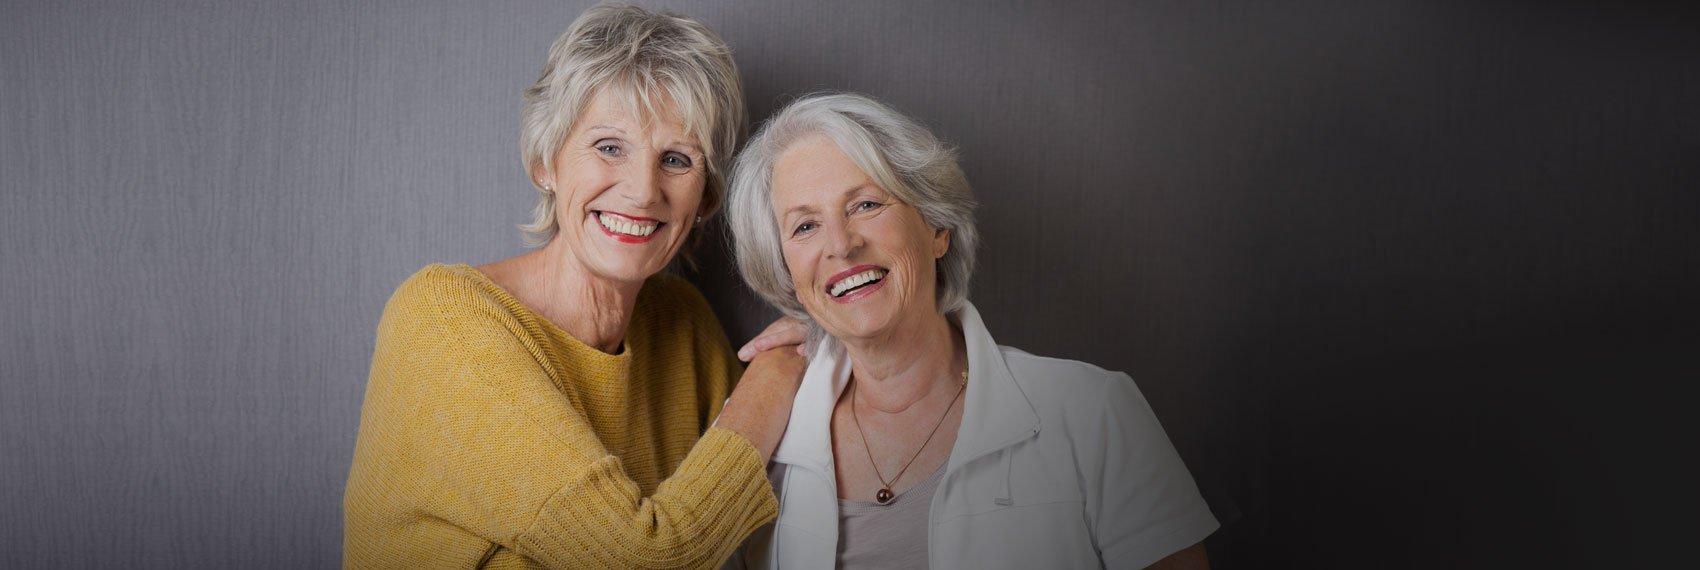 Seniors' <br />Quality of Life